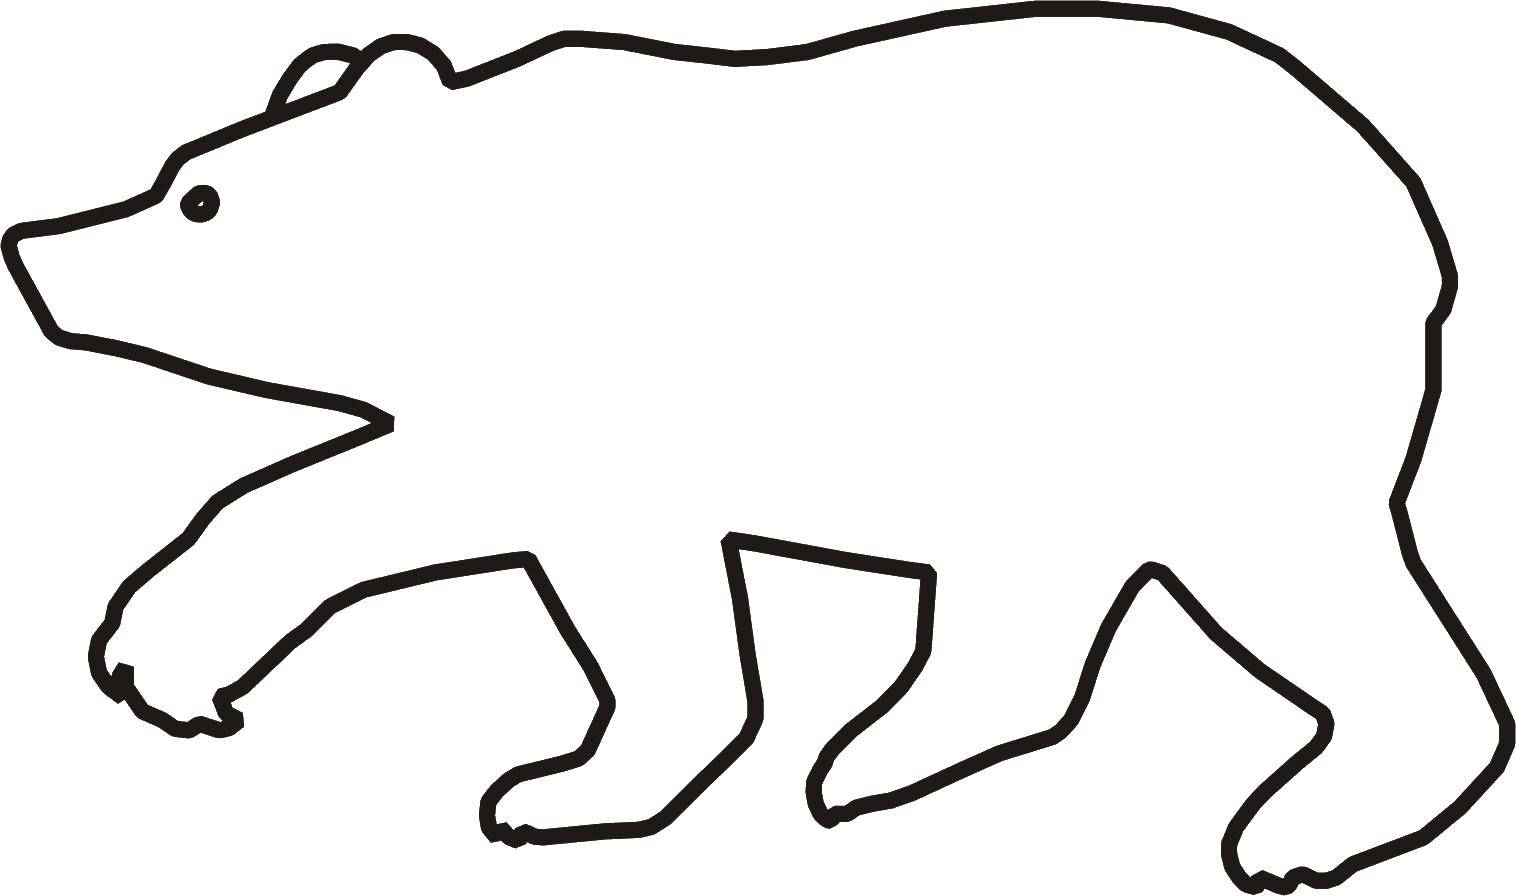 Контур животного картинка